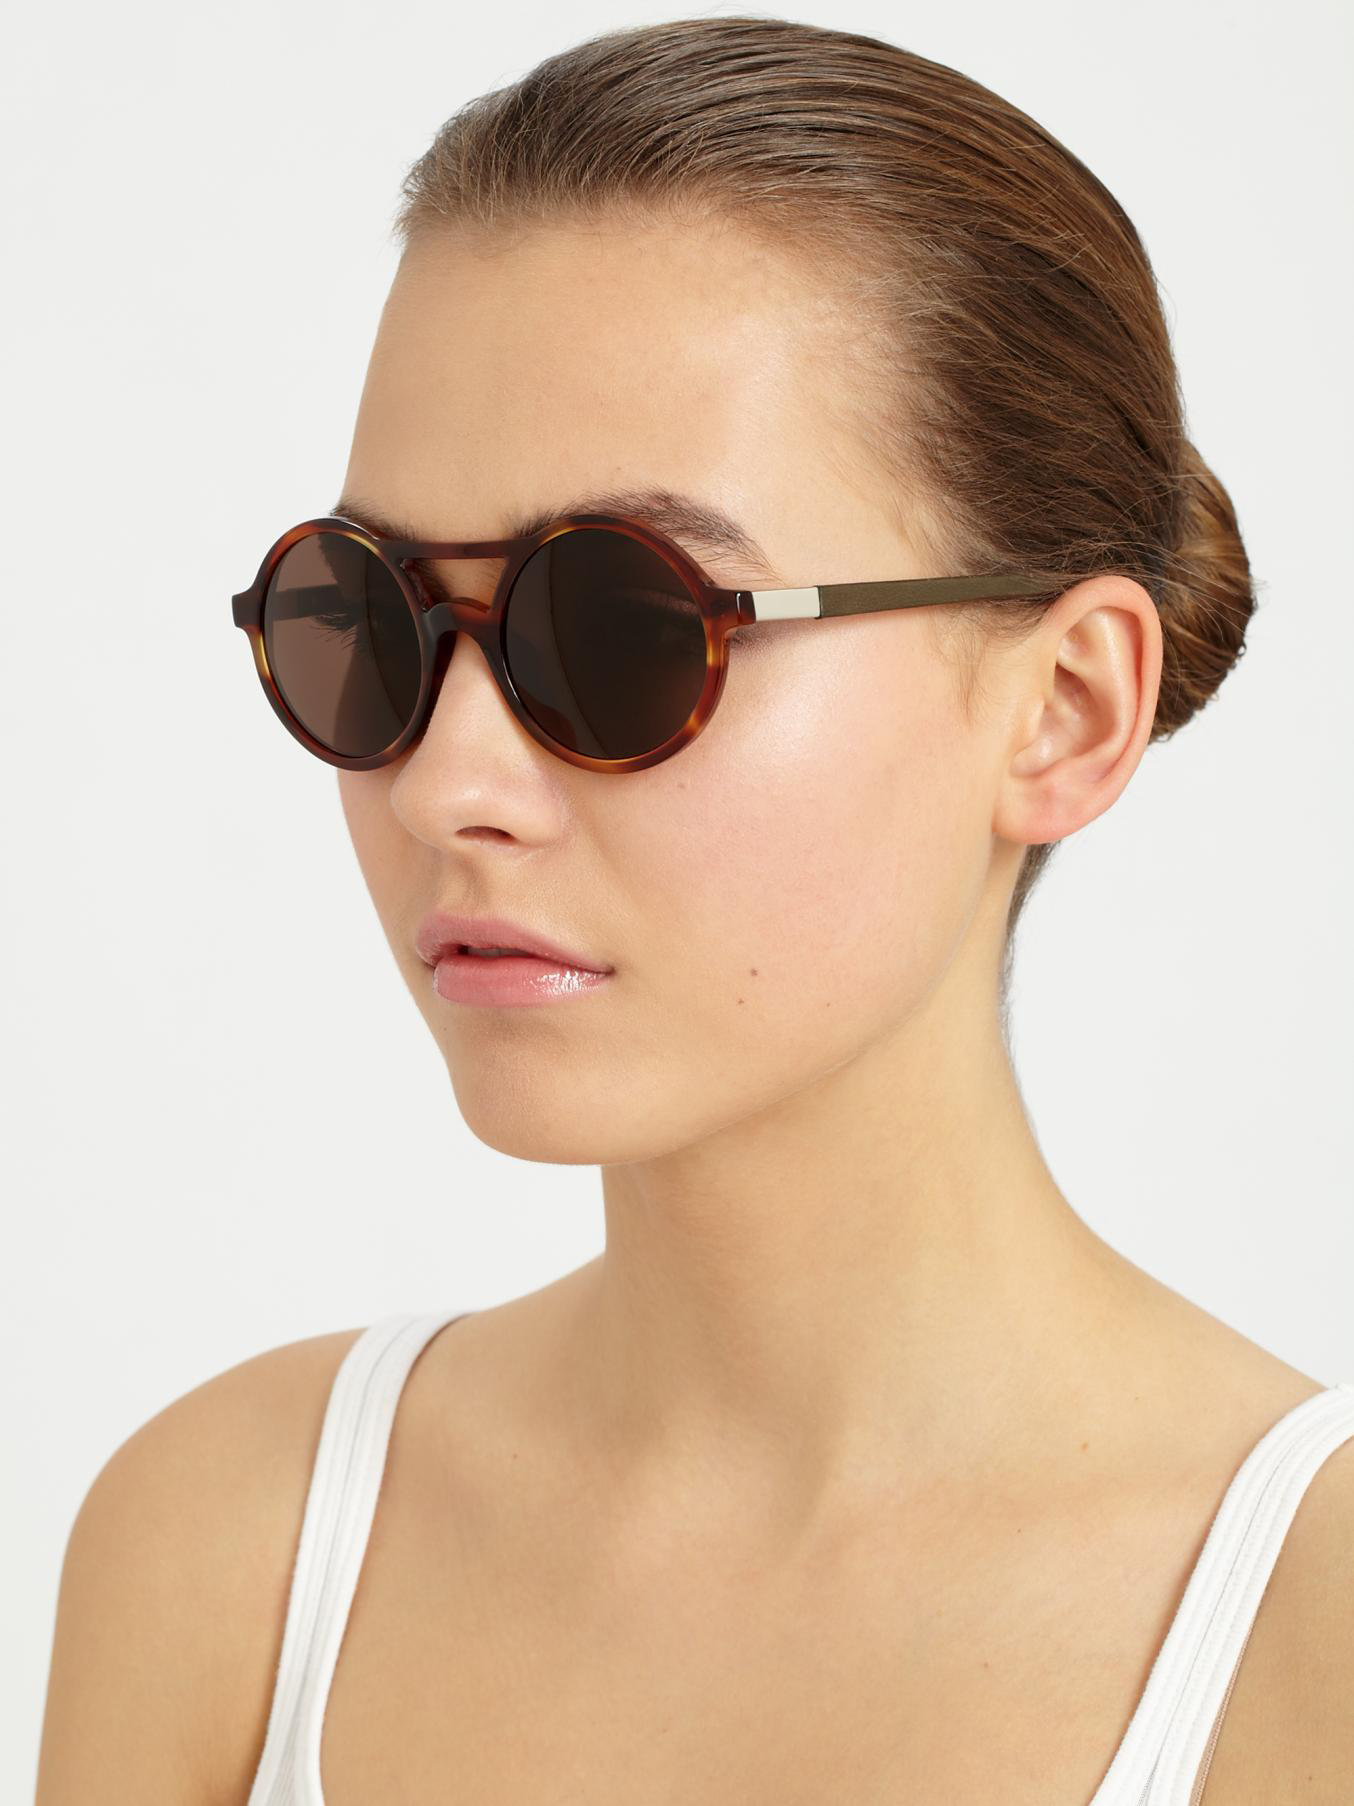 Lyst The Row Round Tortoiseshell Acetate Sunglasses in Brown